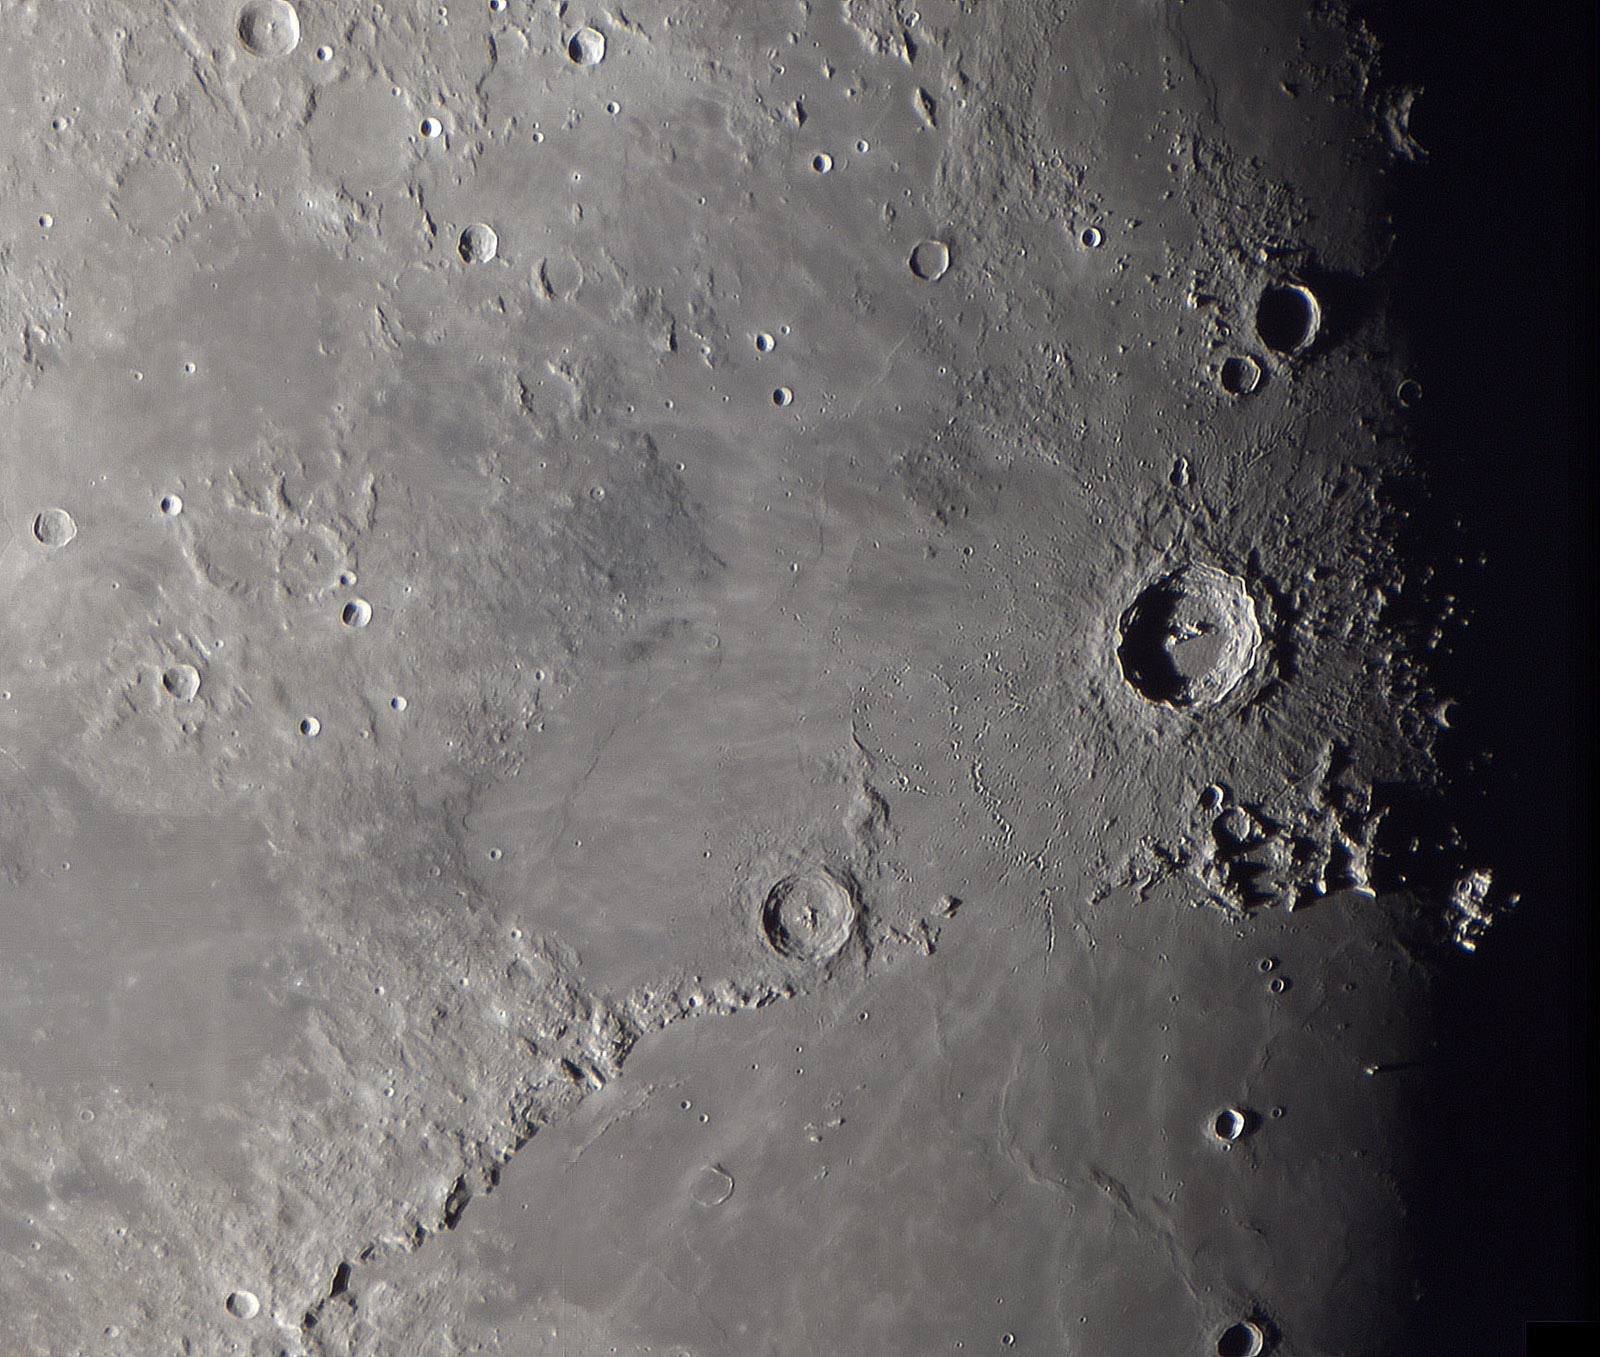 Pano Copernic 31 mai 2020.jpg